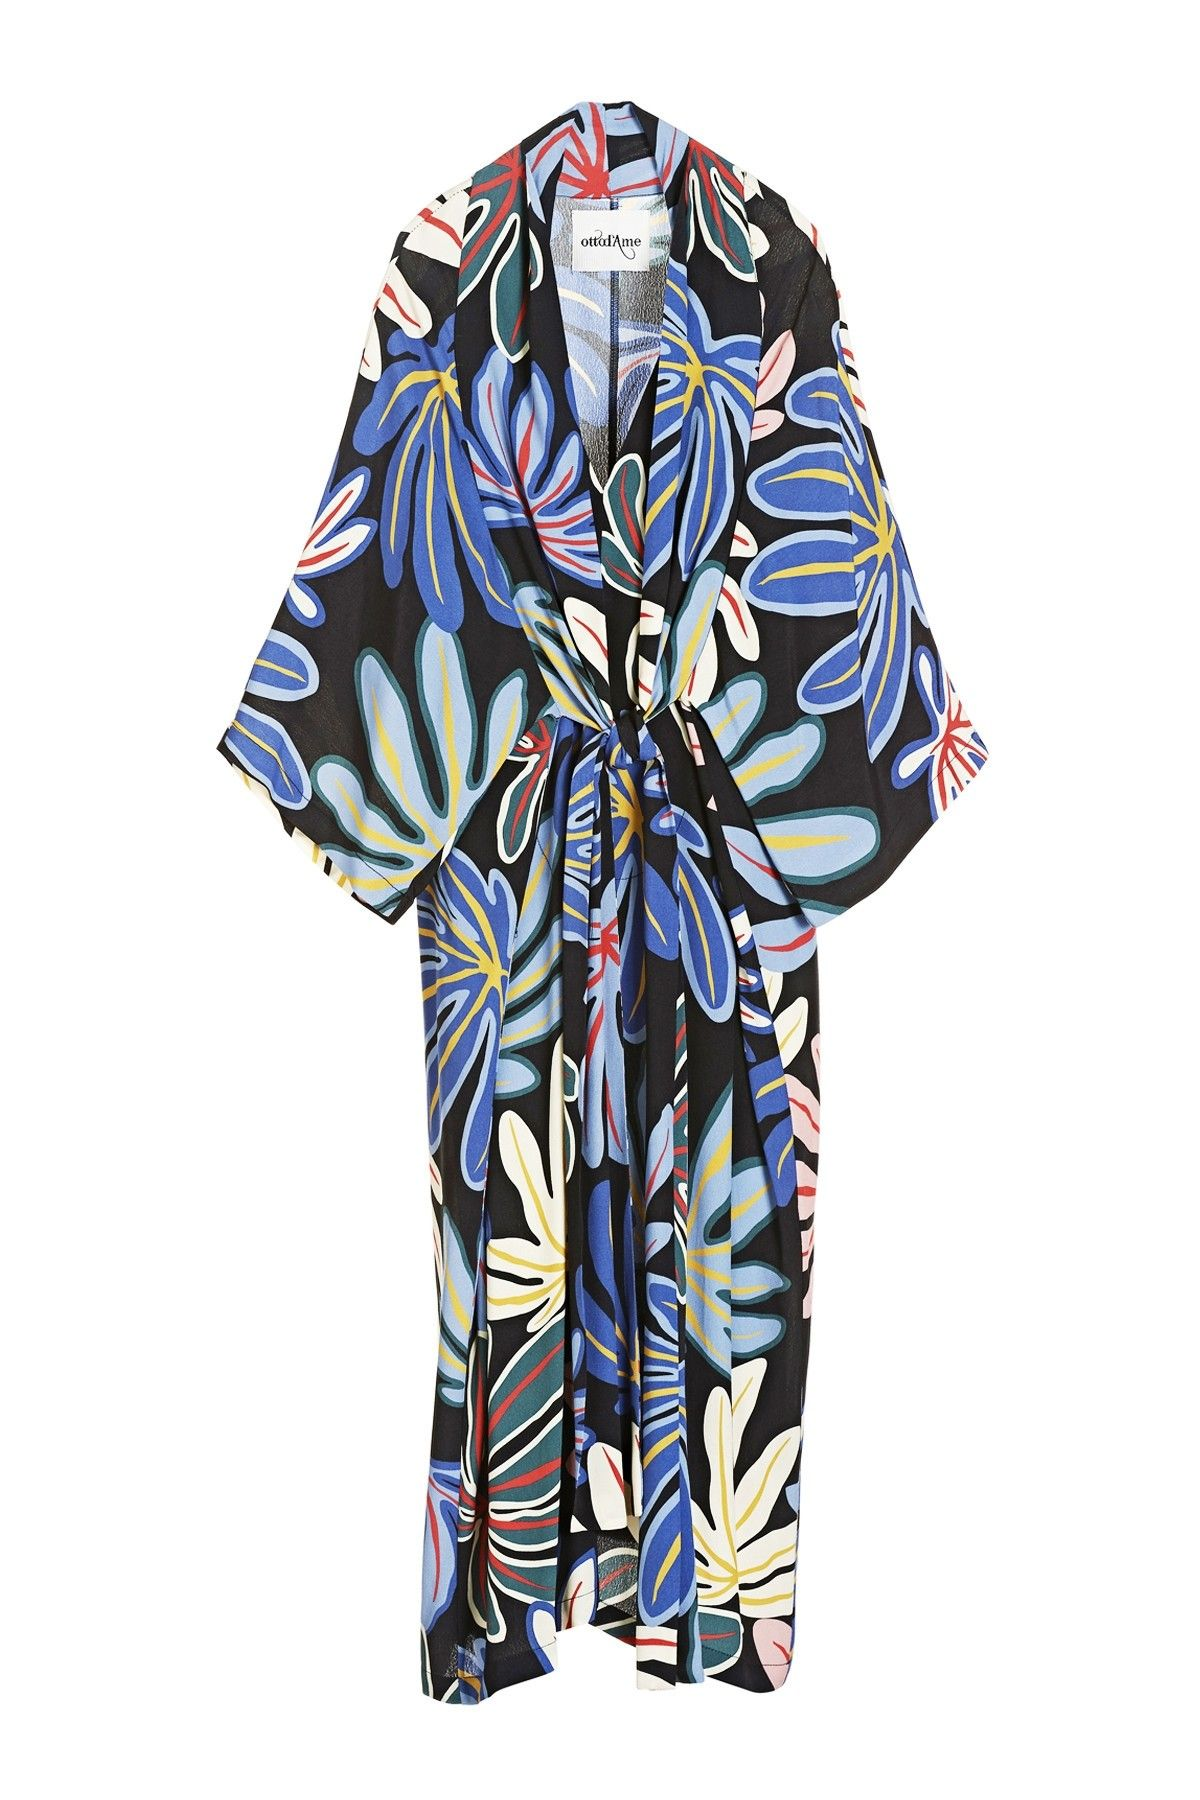 OTTOD'AME - Kleid - Abito Dress - Var. Unica Blu